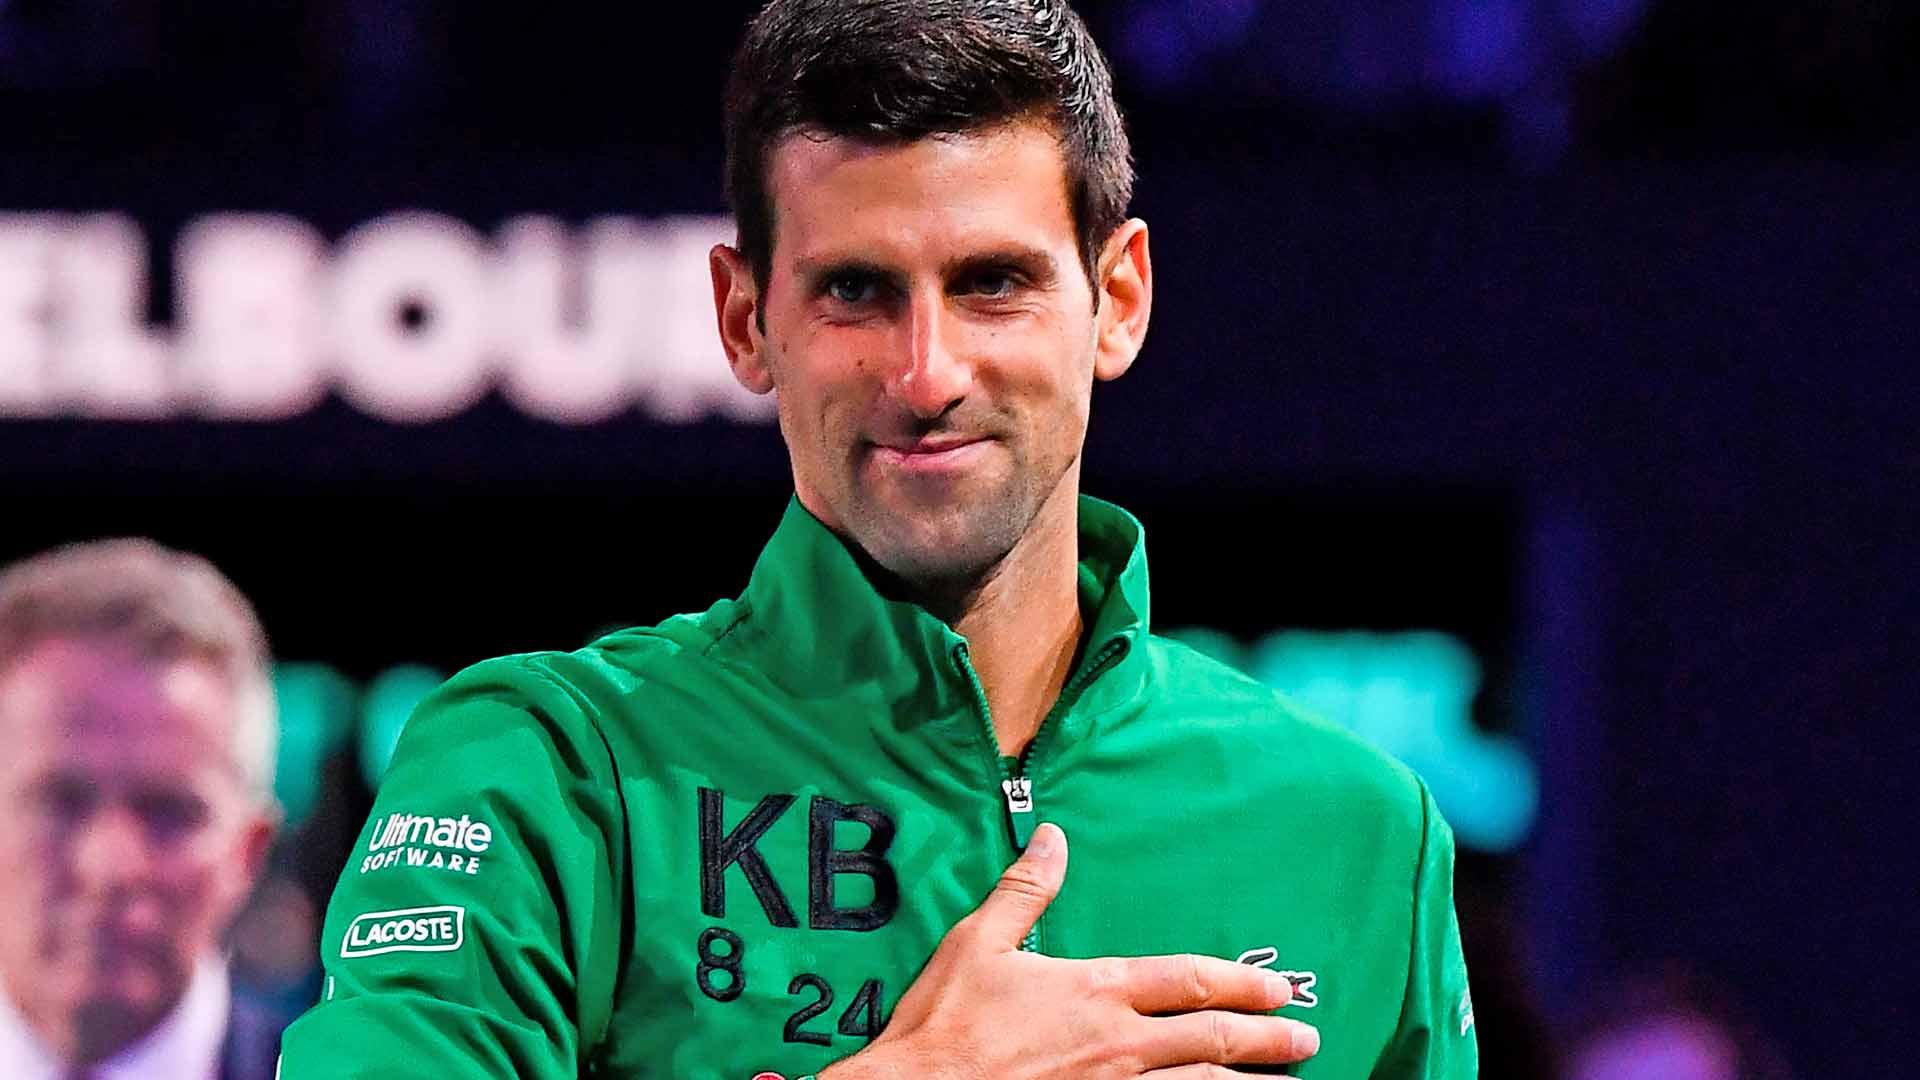 Novak Djokovic Pays Tribute To Kobe Bryant Bushfire Victims In Australian Open Victory Speech Atp Tour Tennis